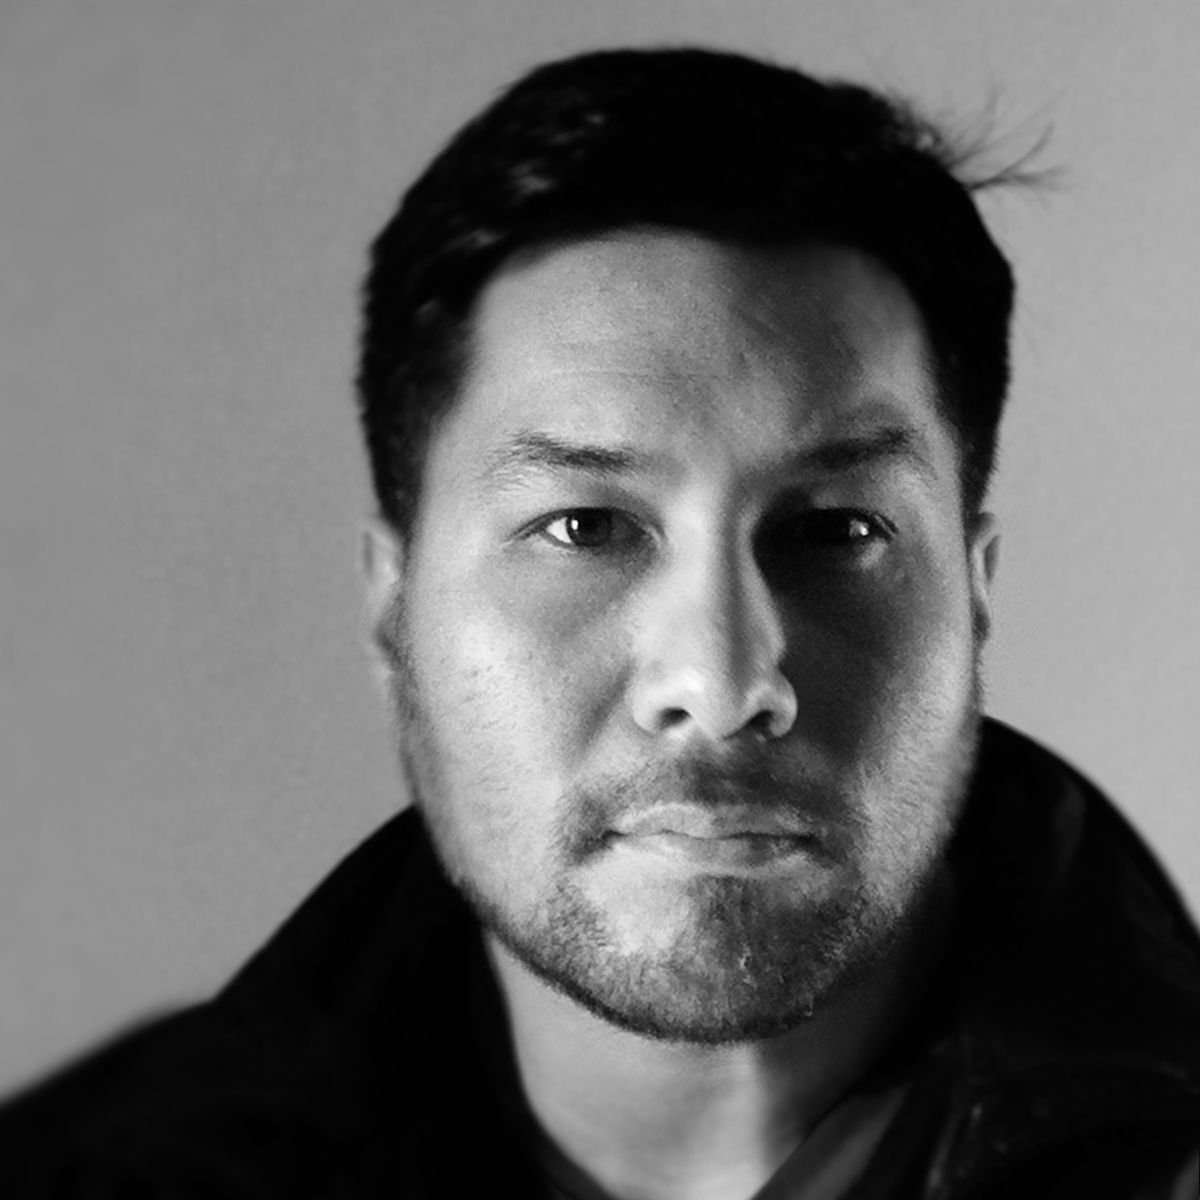 Eddy V. - The Digital & Tech Designer